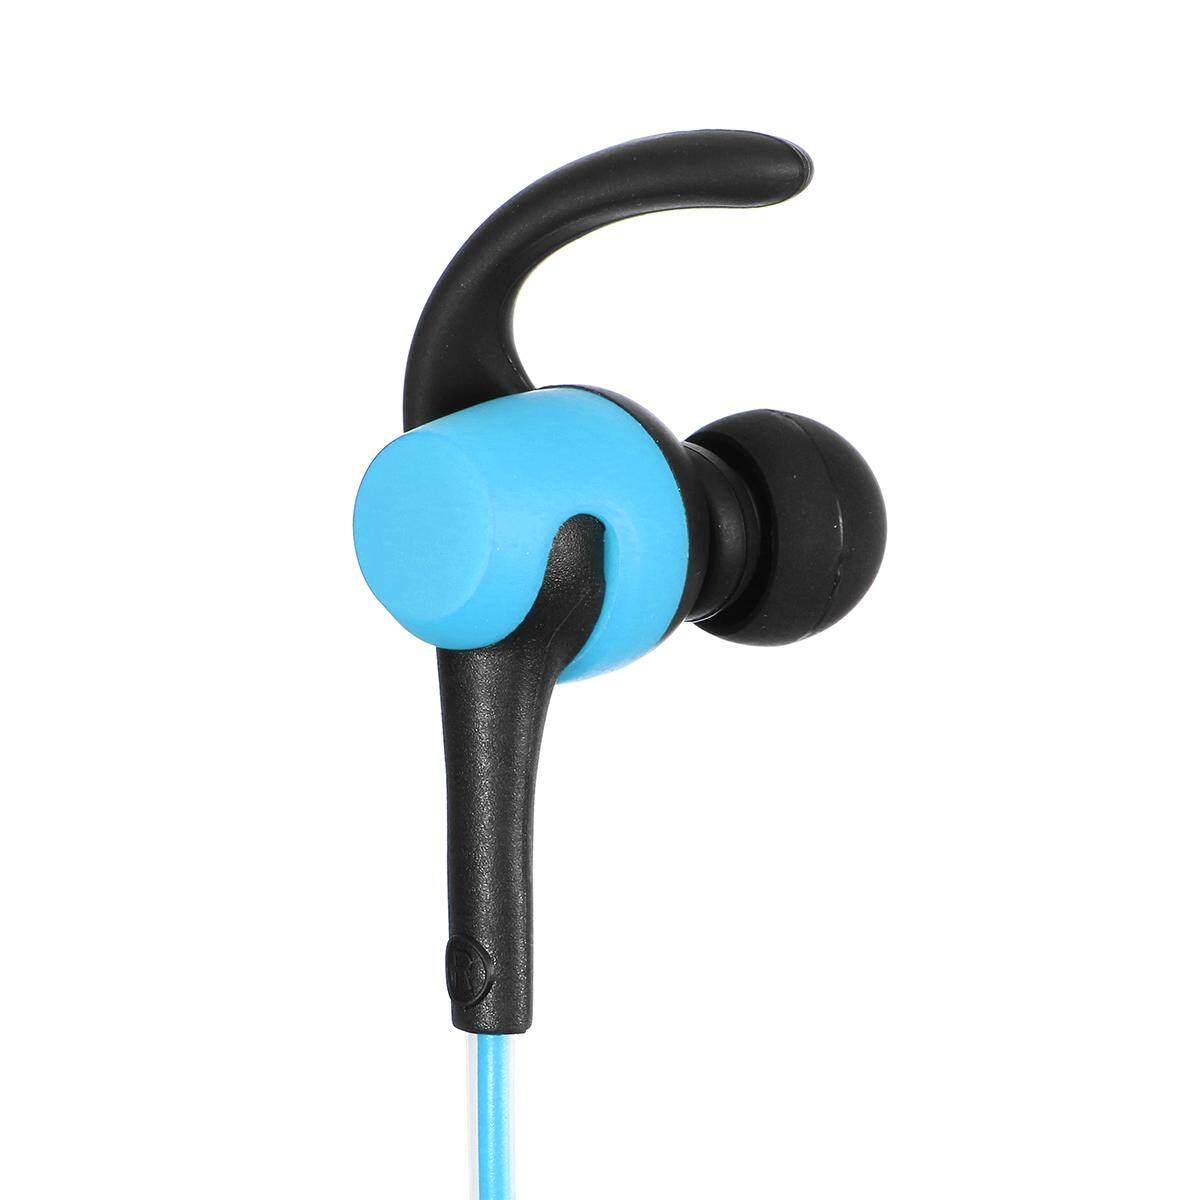 5b1557b1c52 LED Wireless bluetooth Headphone Sport Stereo HIFI Headset Earbud Earphone  Gift Blue - intl